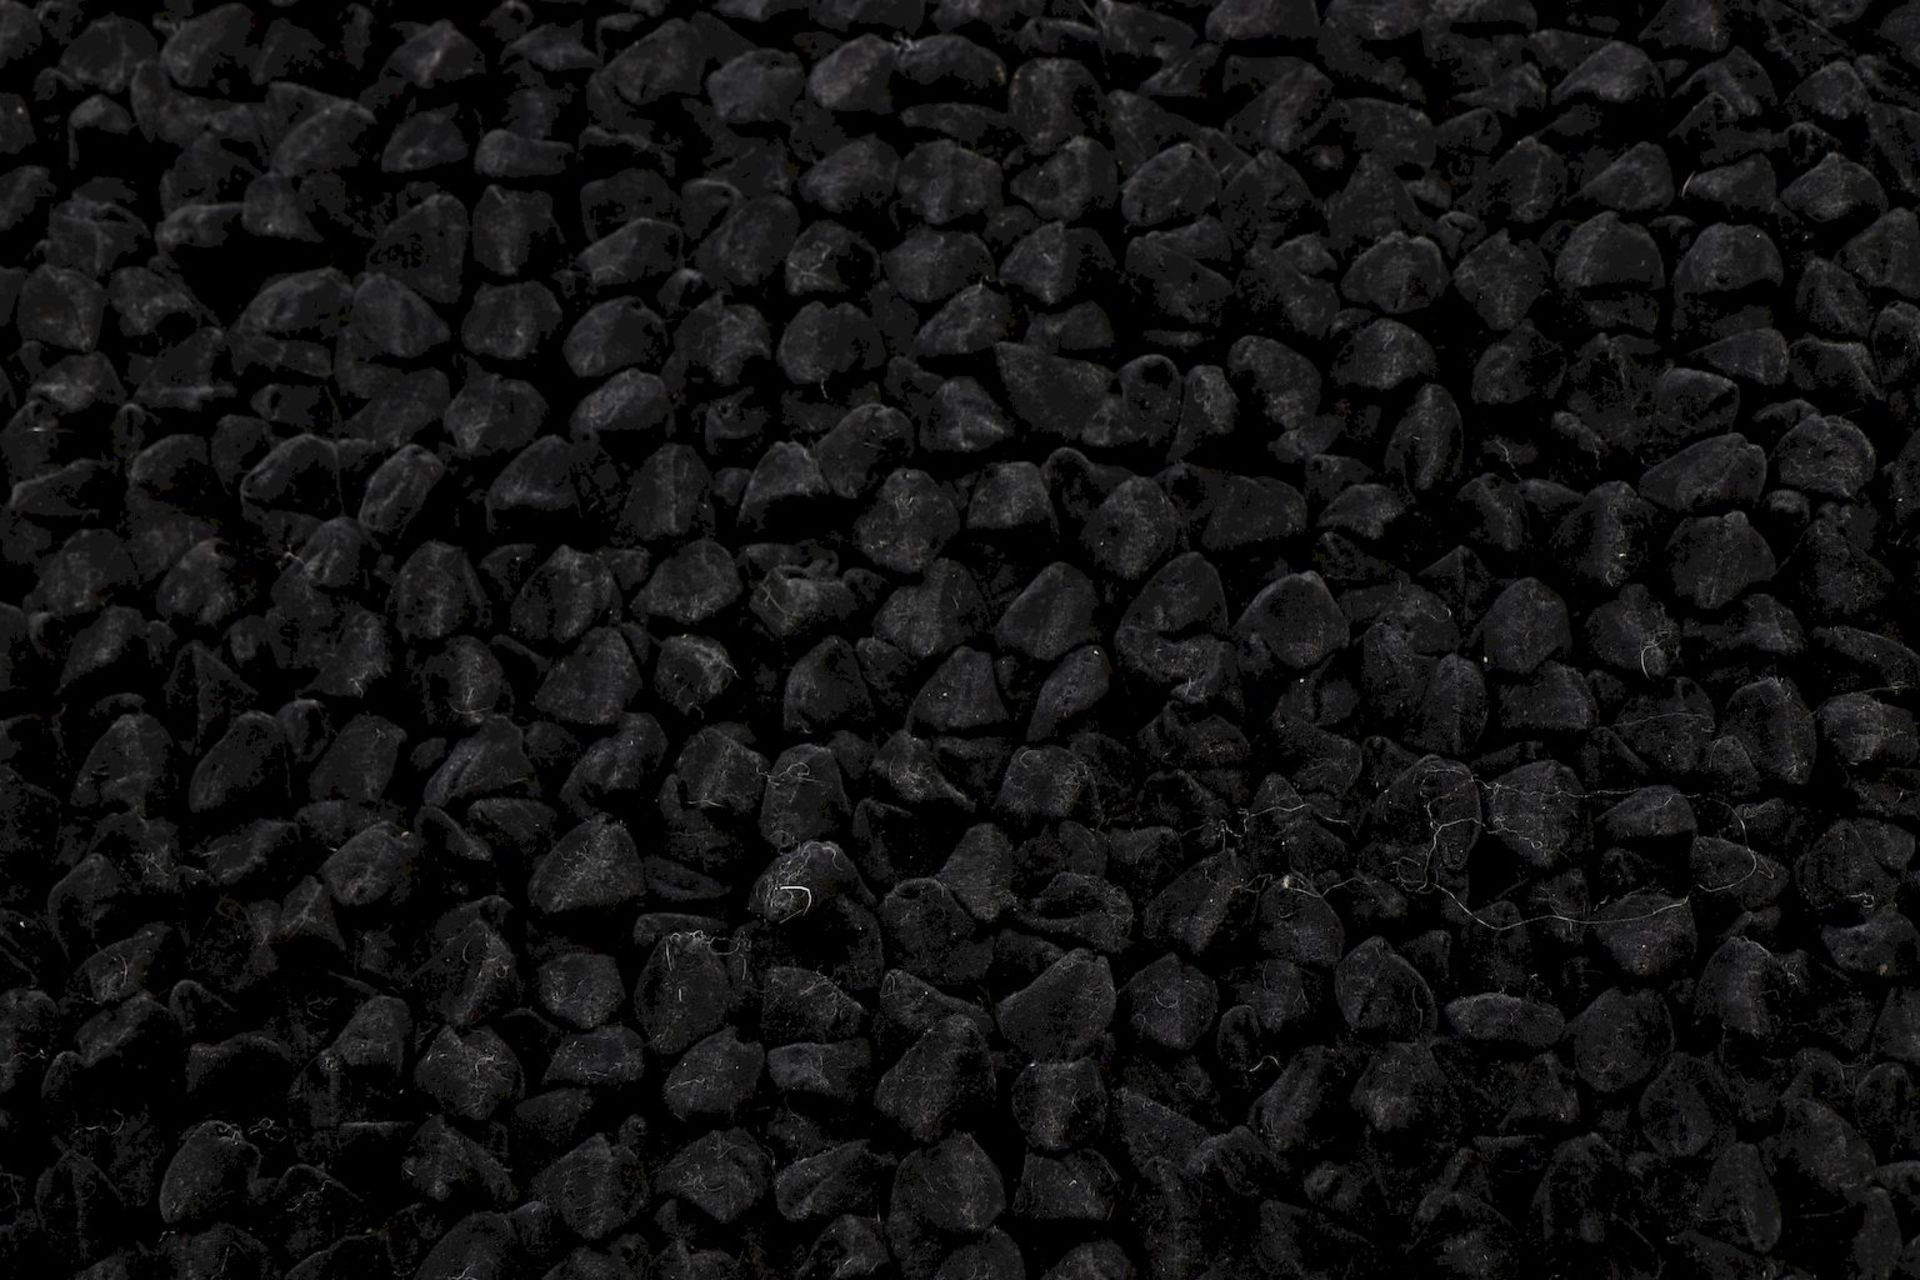 Teppich im ¨Pebble¨ Stil - Image 2 of 3